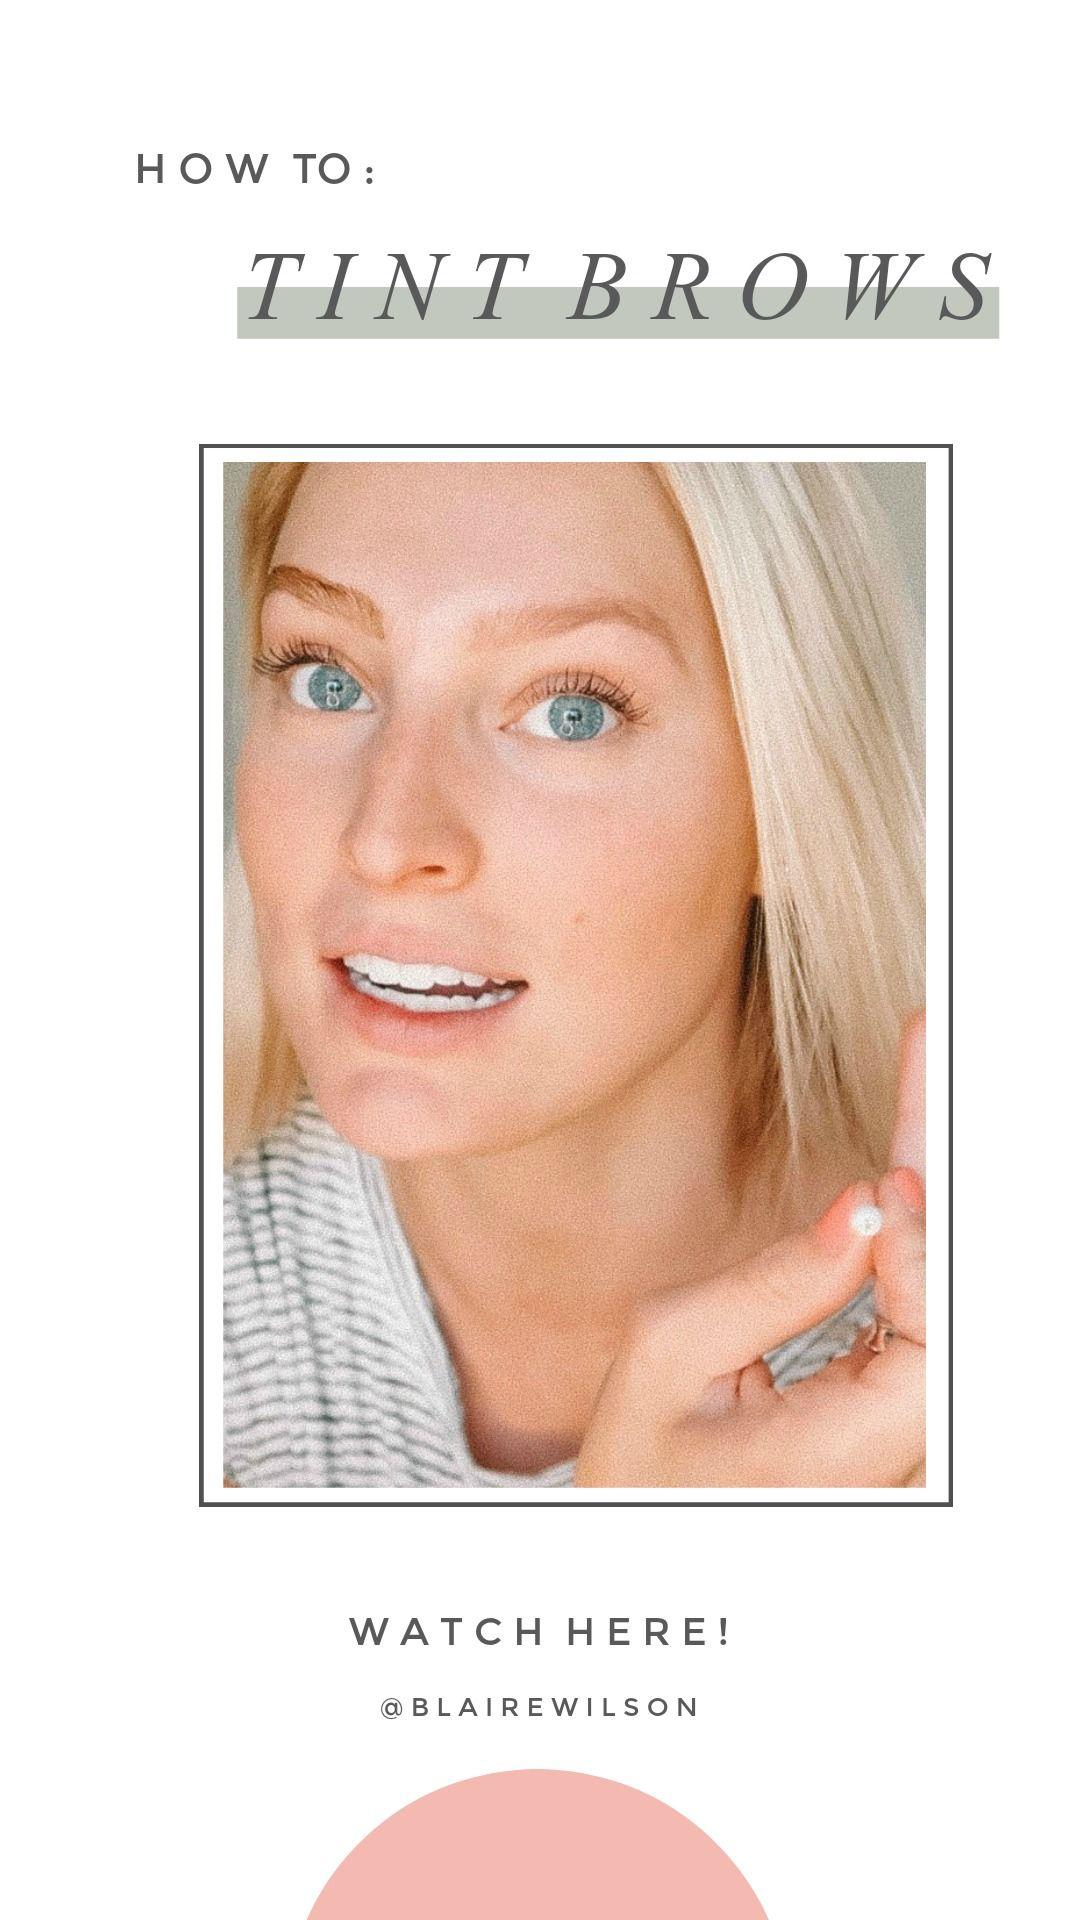 I Dyed Tinted My Light Blonde Eyebrows Using Just For Men Mustache Beard Dye It Was So Easy And Great For My Light B Blonde Eyebrows Guys Eyebrows Beard Dye